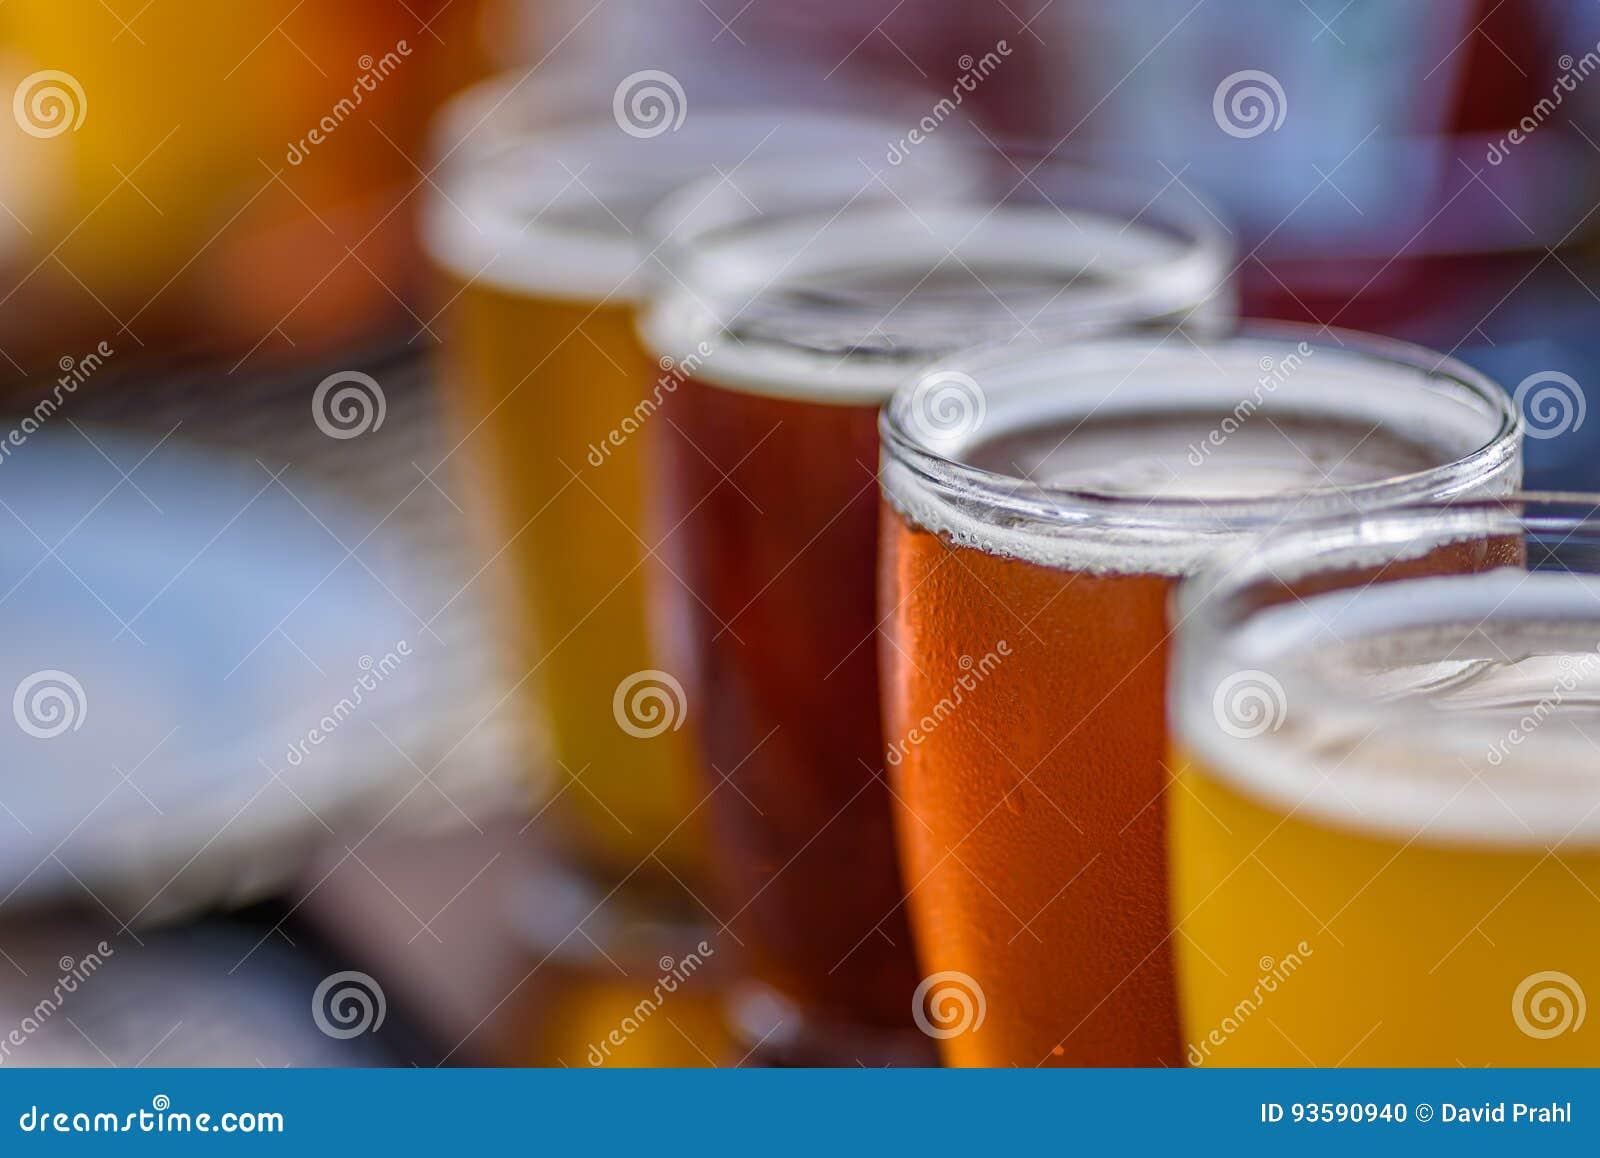 Closeup macro of a beer flight in sunlight